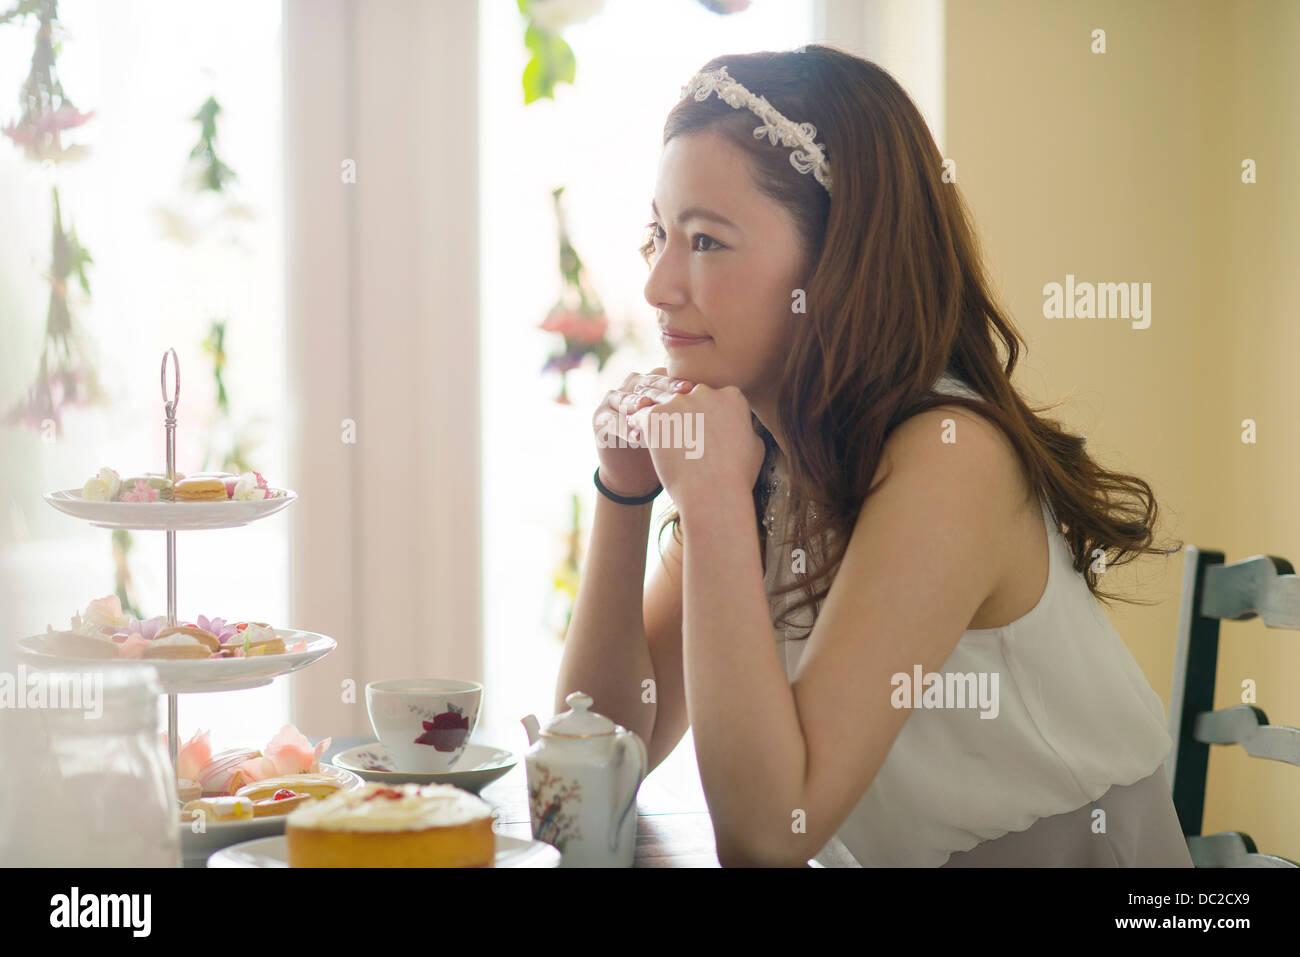 Frau Tagtraeume zur Teezeit Stockbild